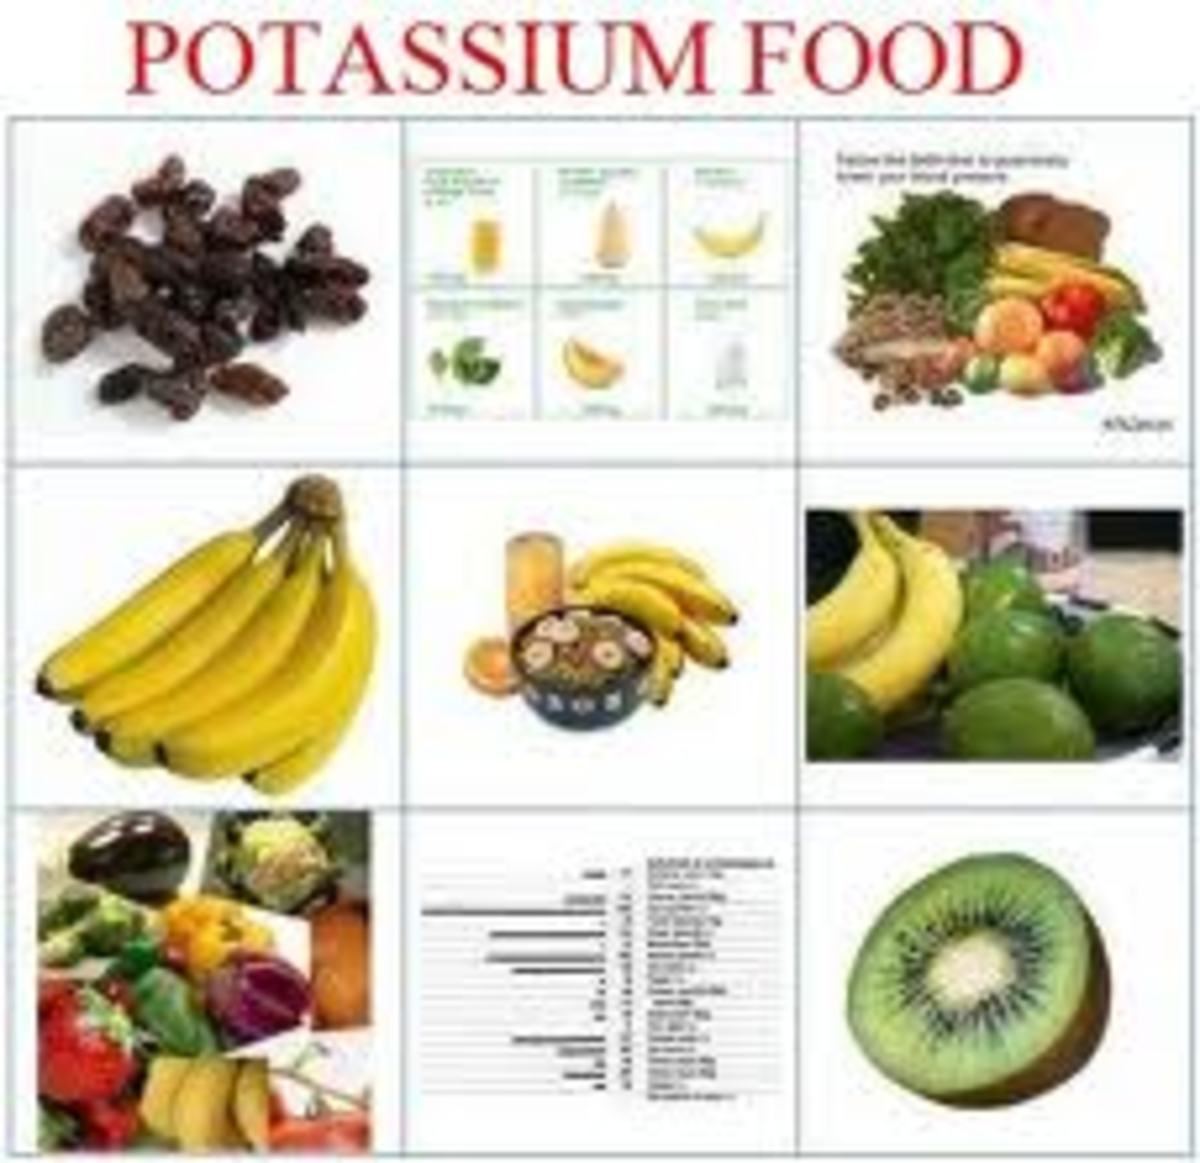 Avoid potassium rich foods while taking aldactone